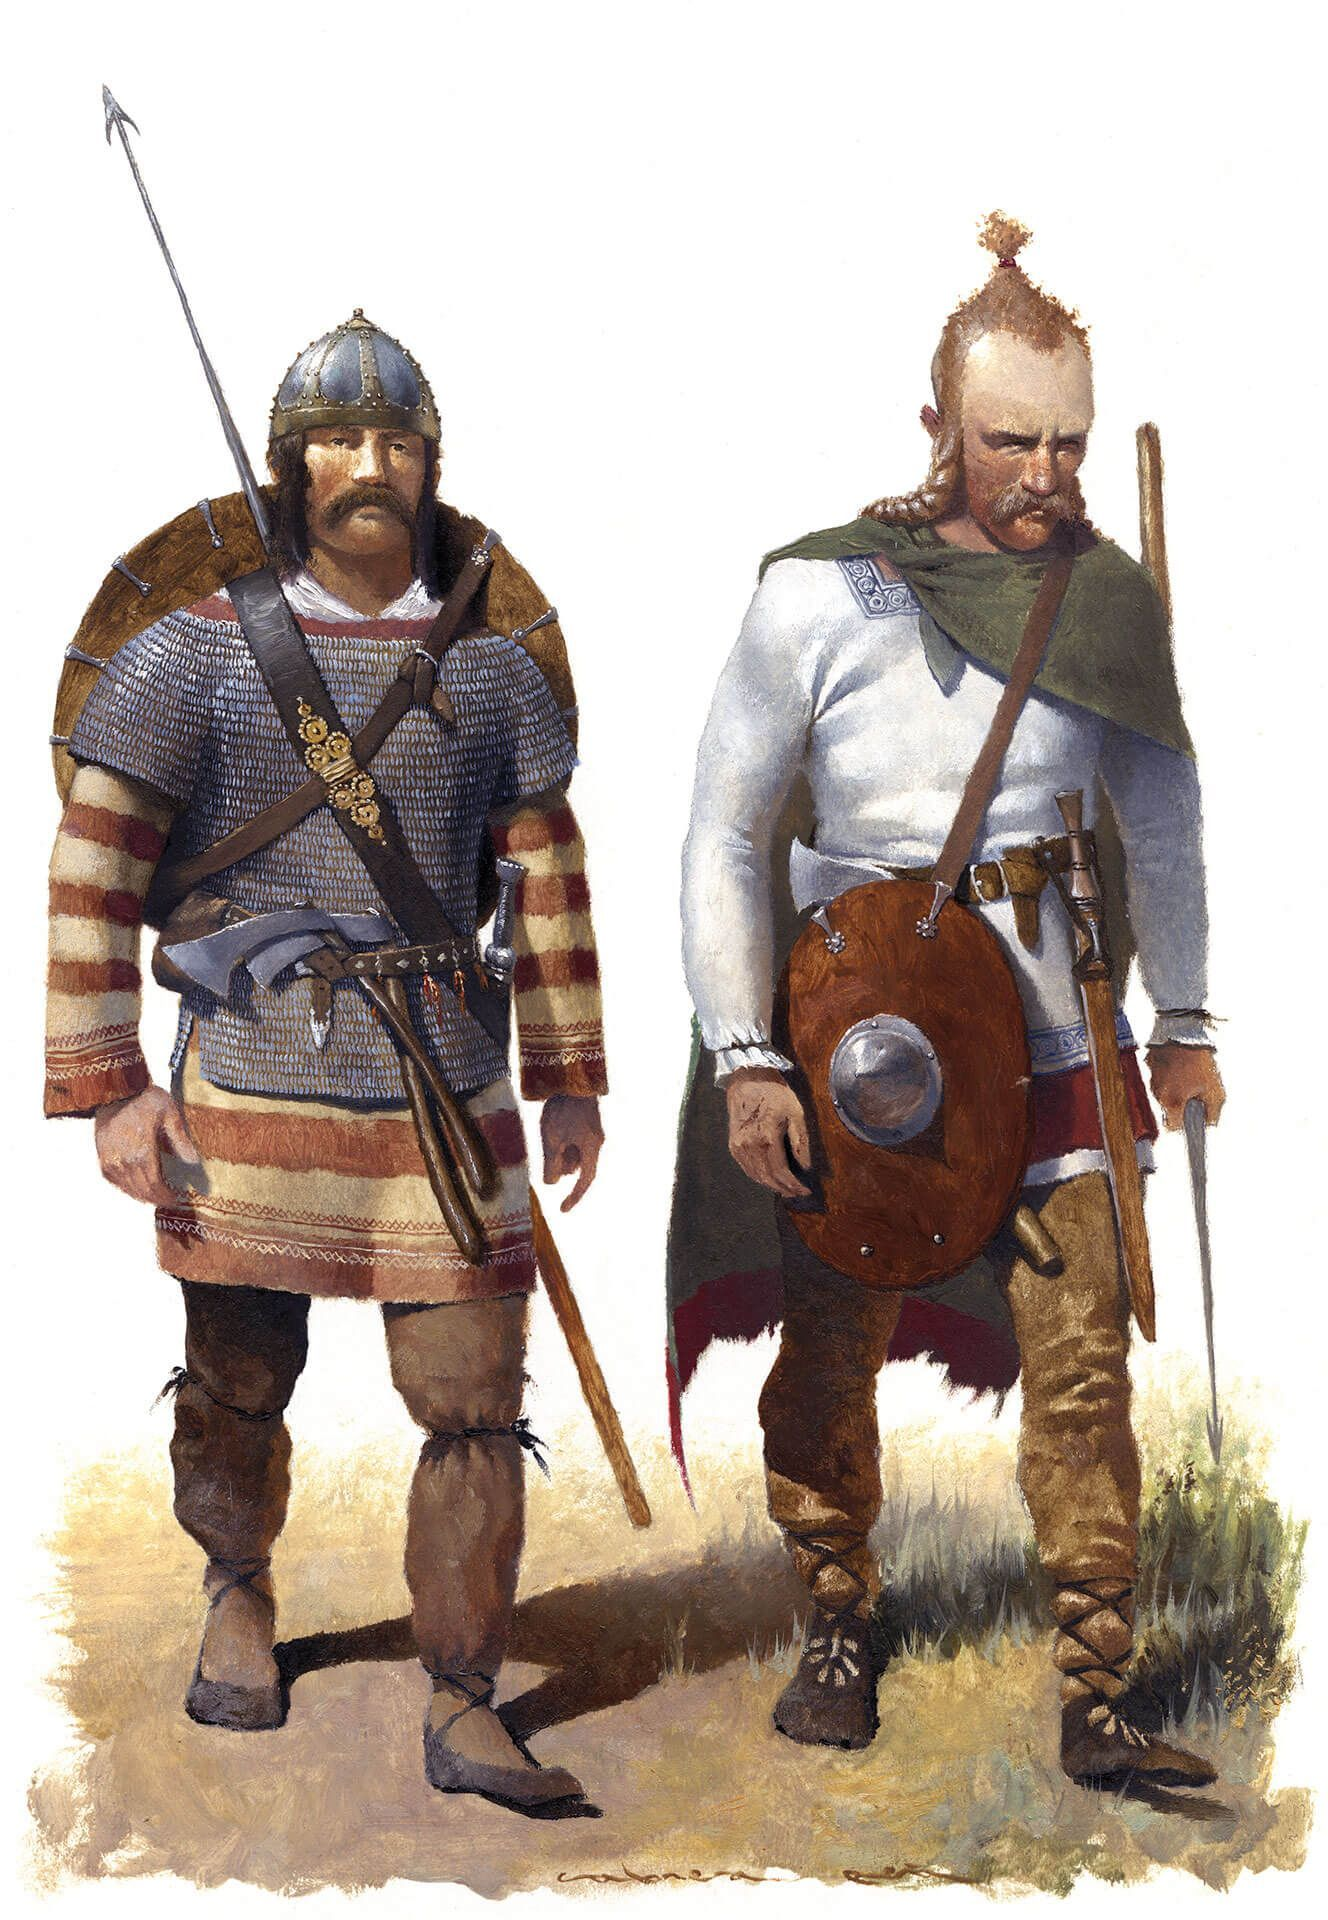 guerreros francos siglo V